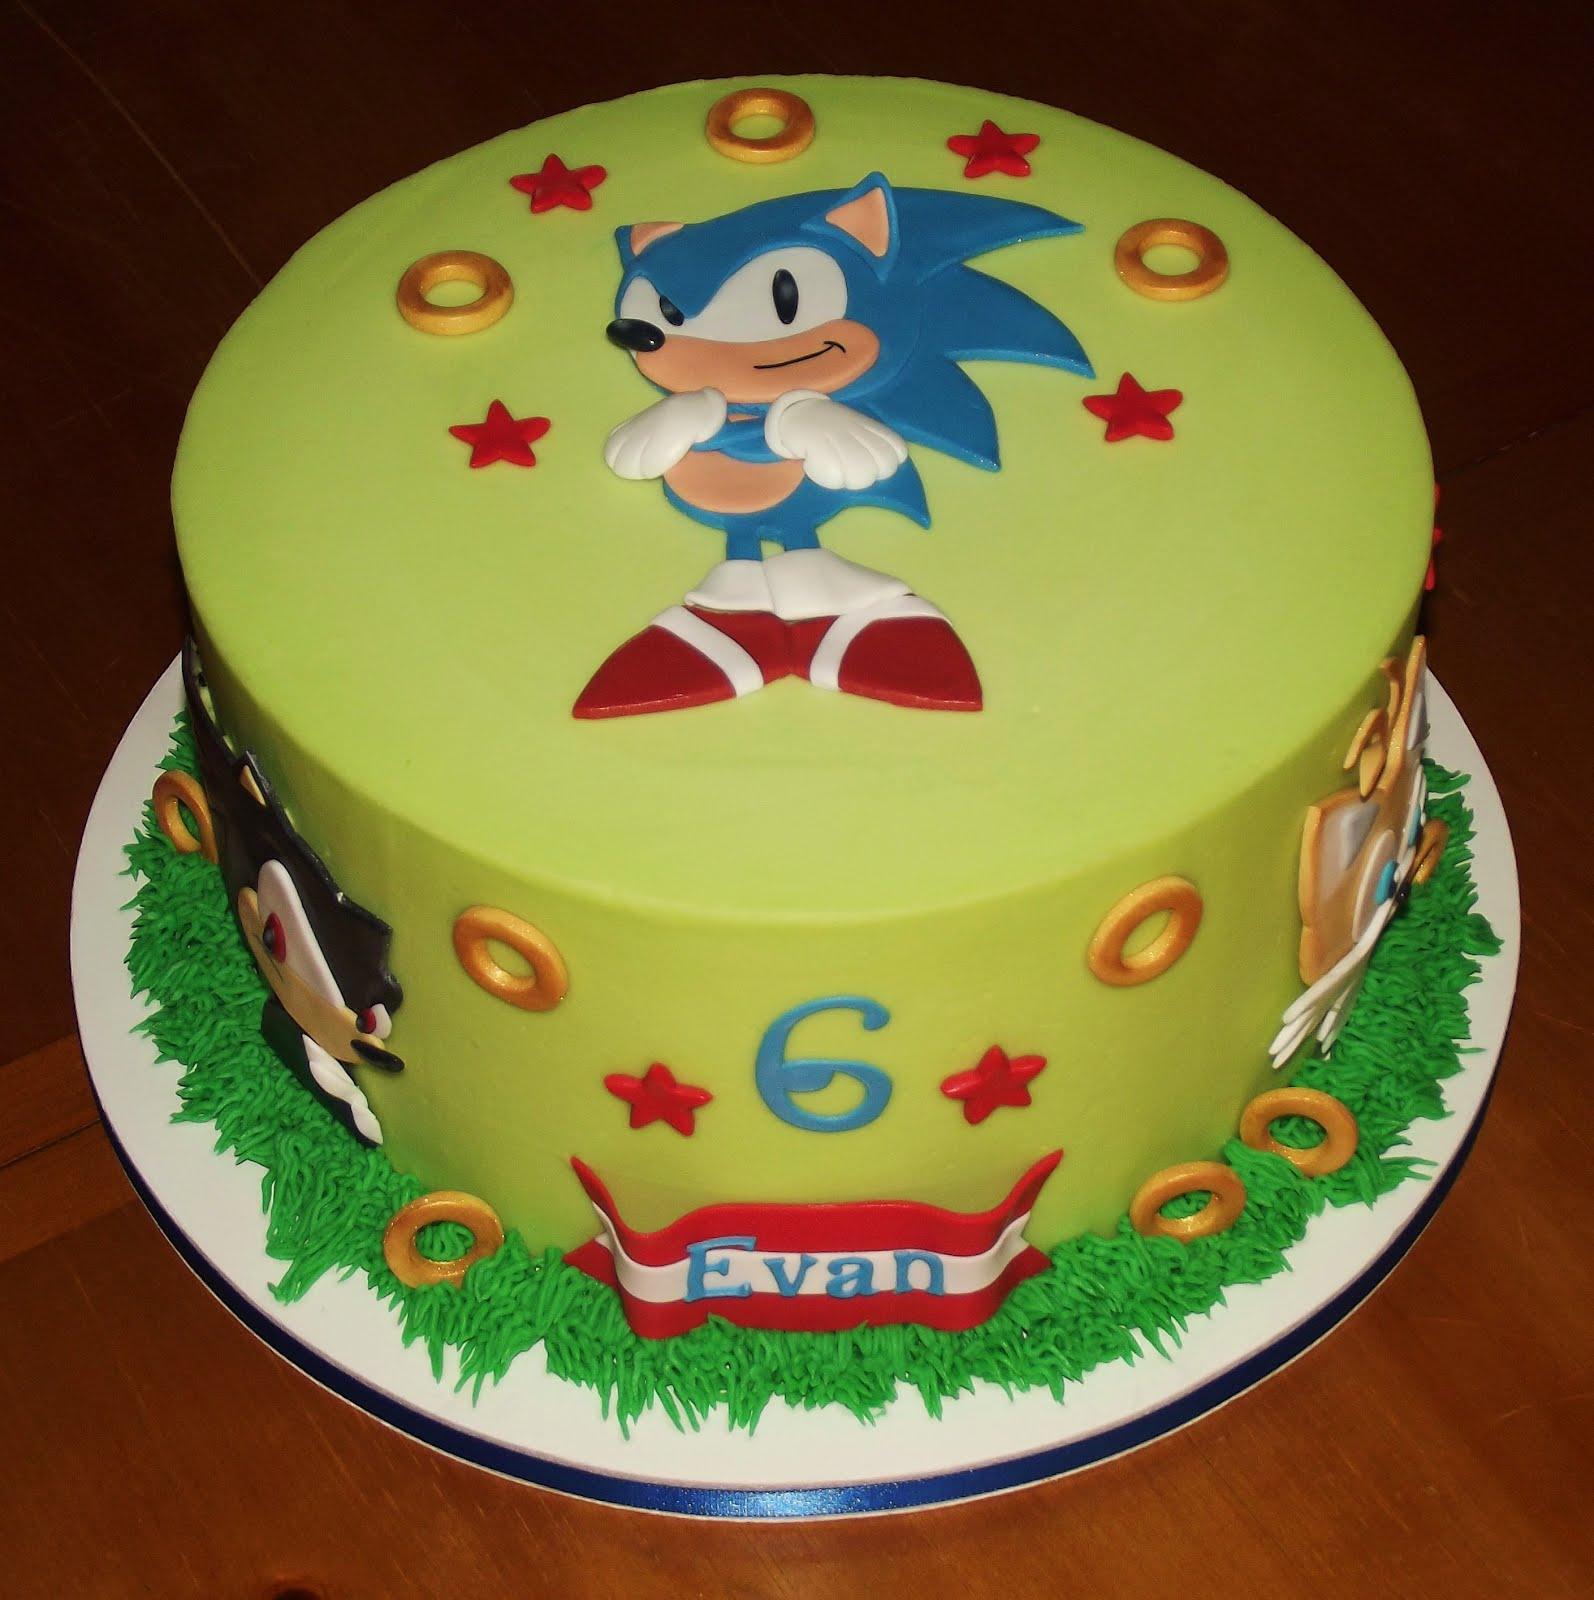 Astonishing Sonic Cakes Decoration Ideas Little Birthday Cakes Personalised Birthday Cards Veneteletsinfo